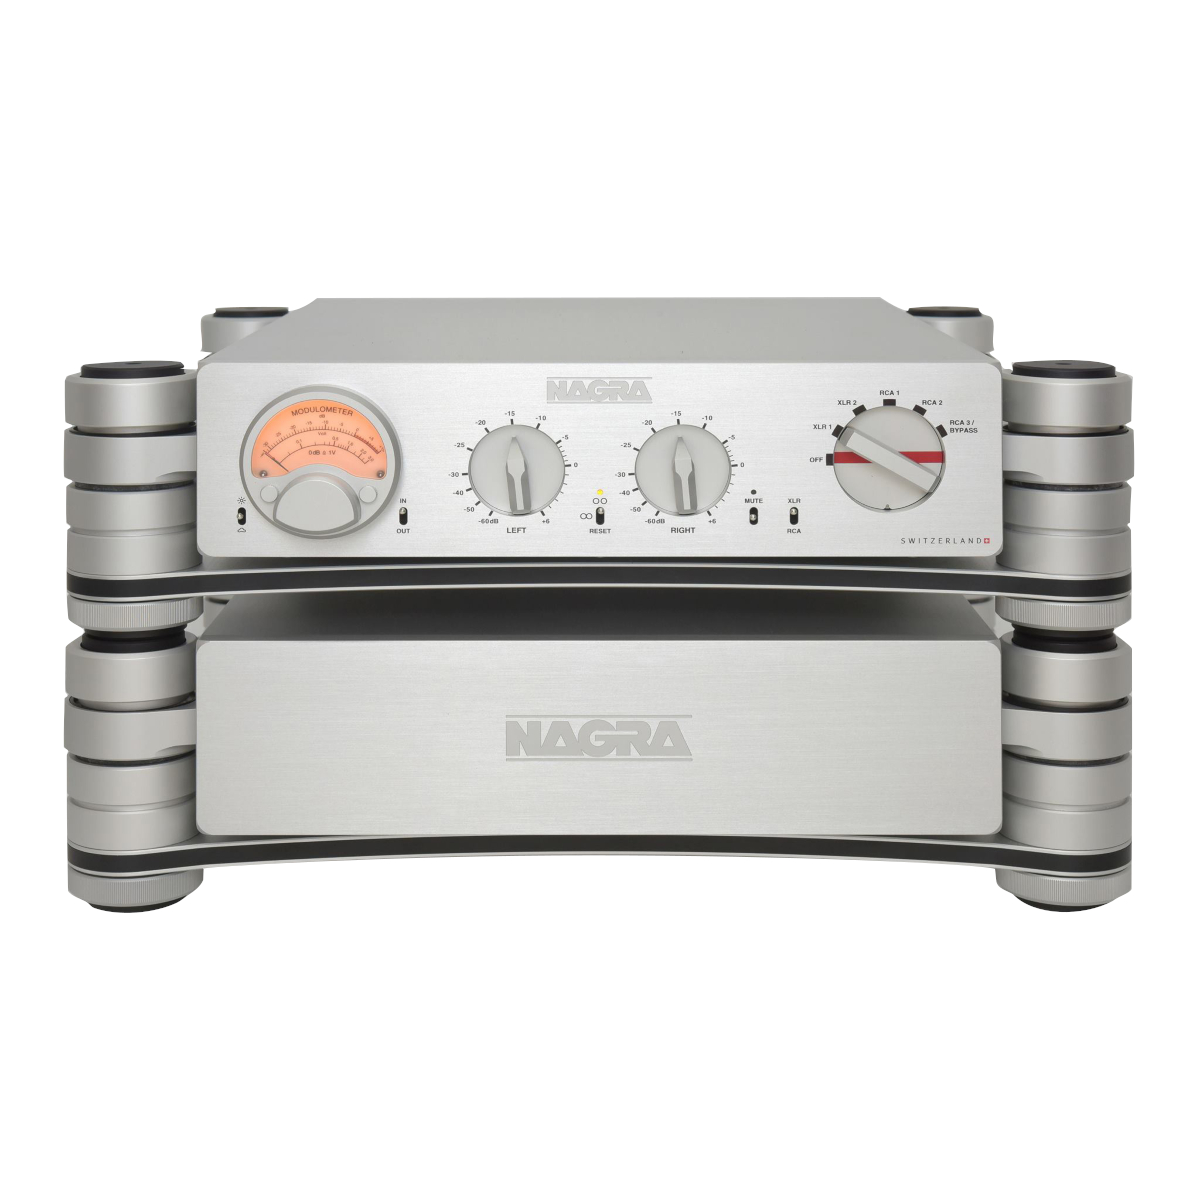 NAGRA HD PREAMP with XLR INPUT ナグラ プリアンプ